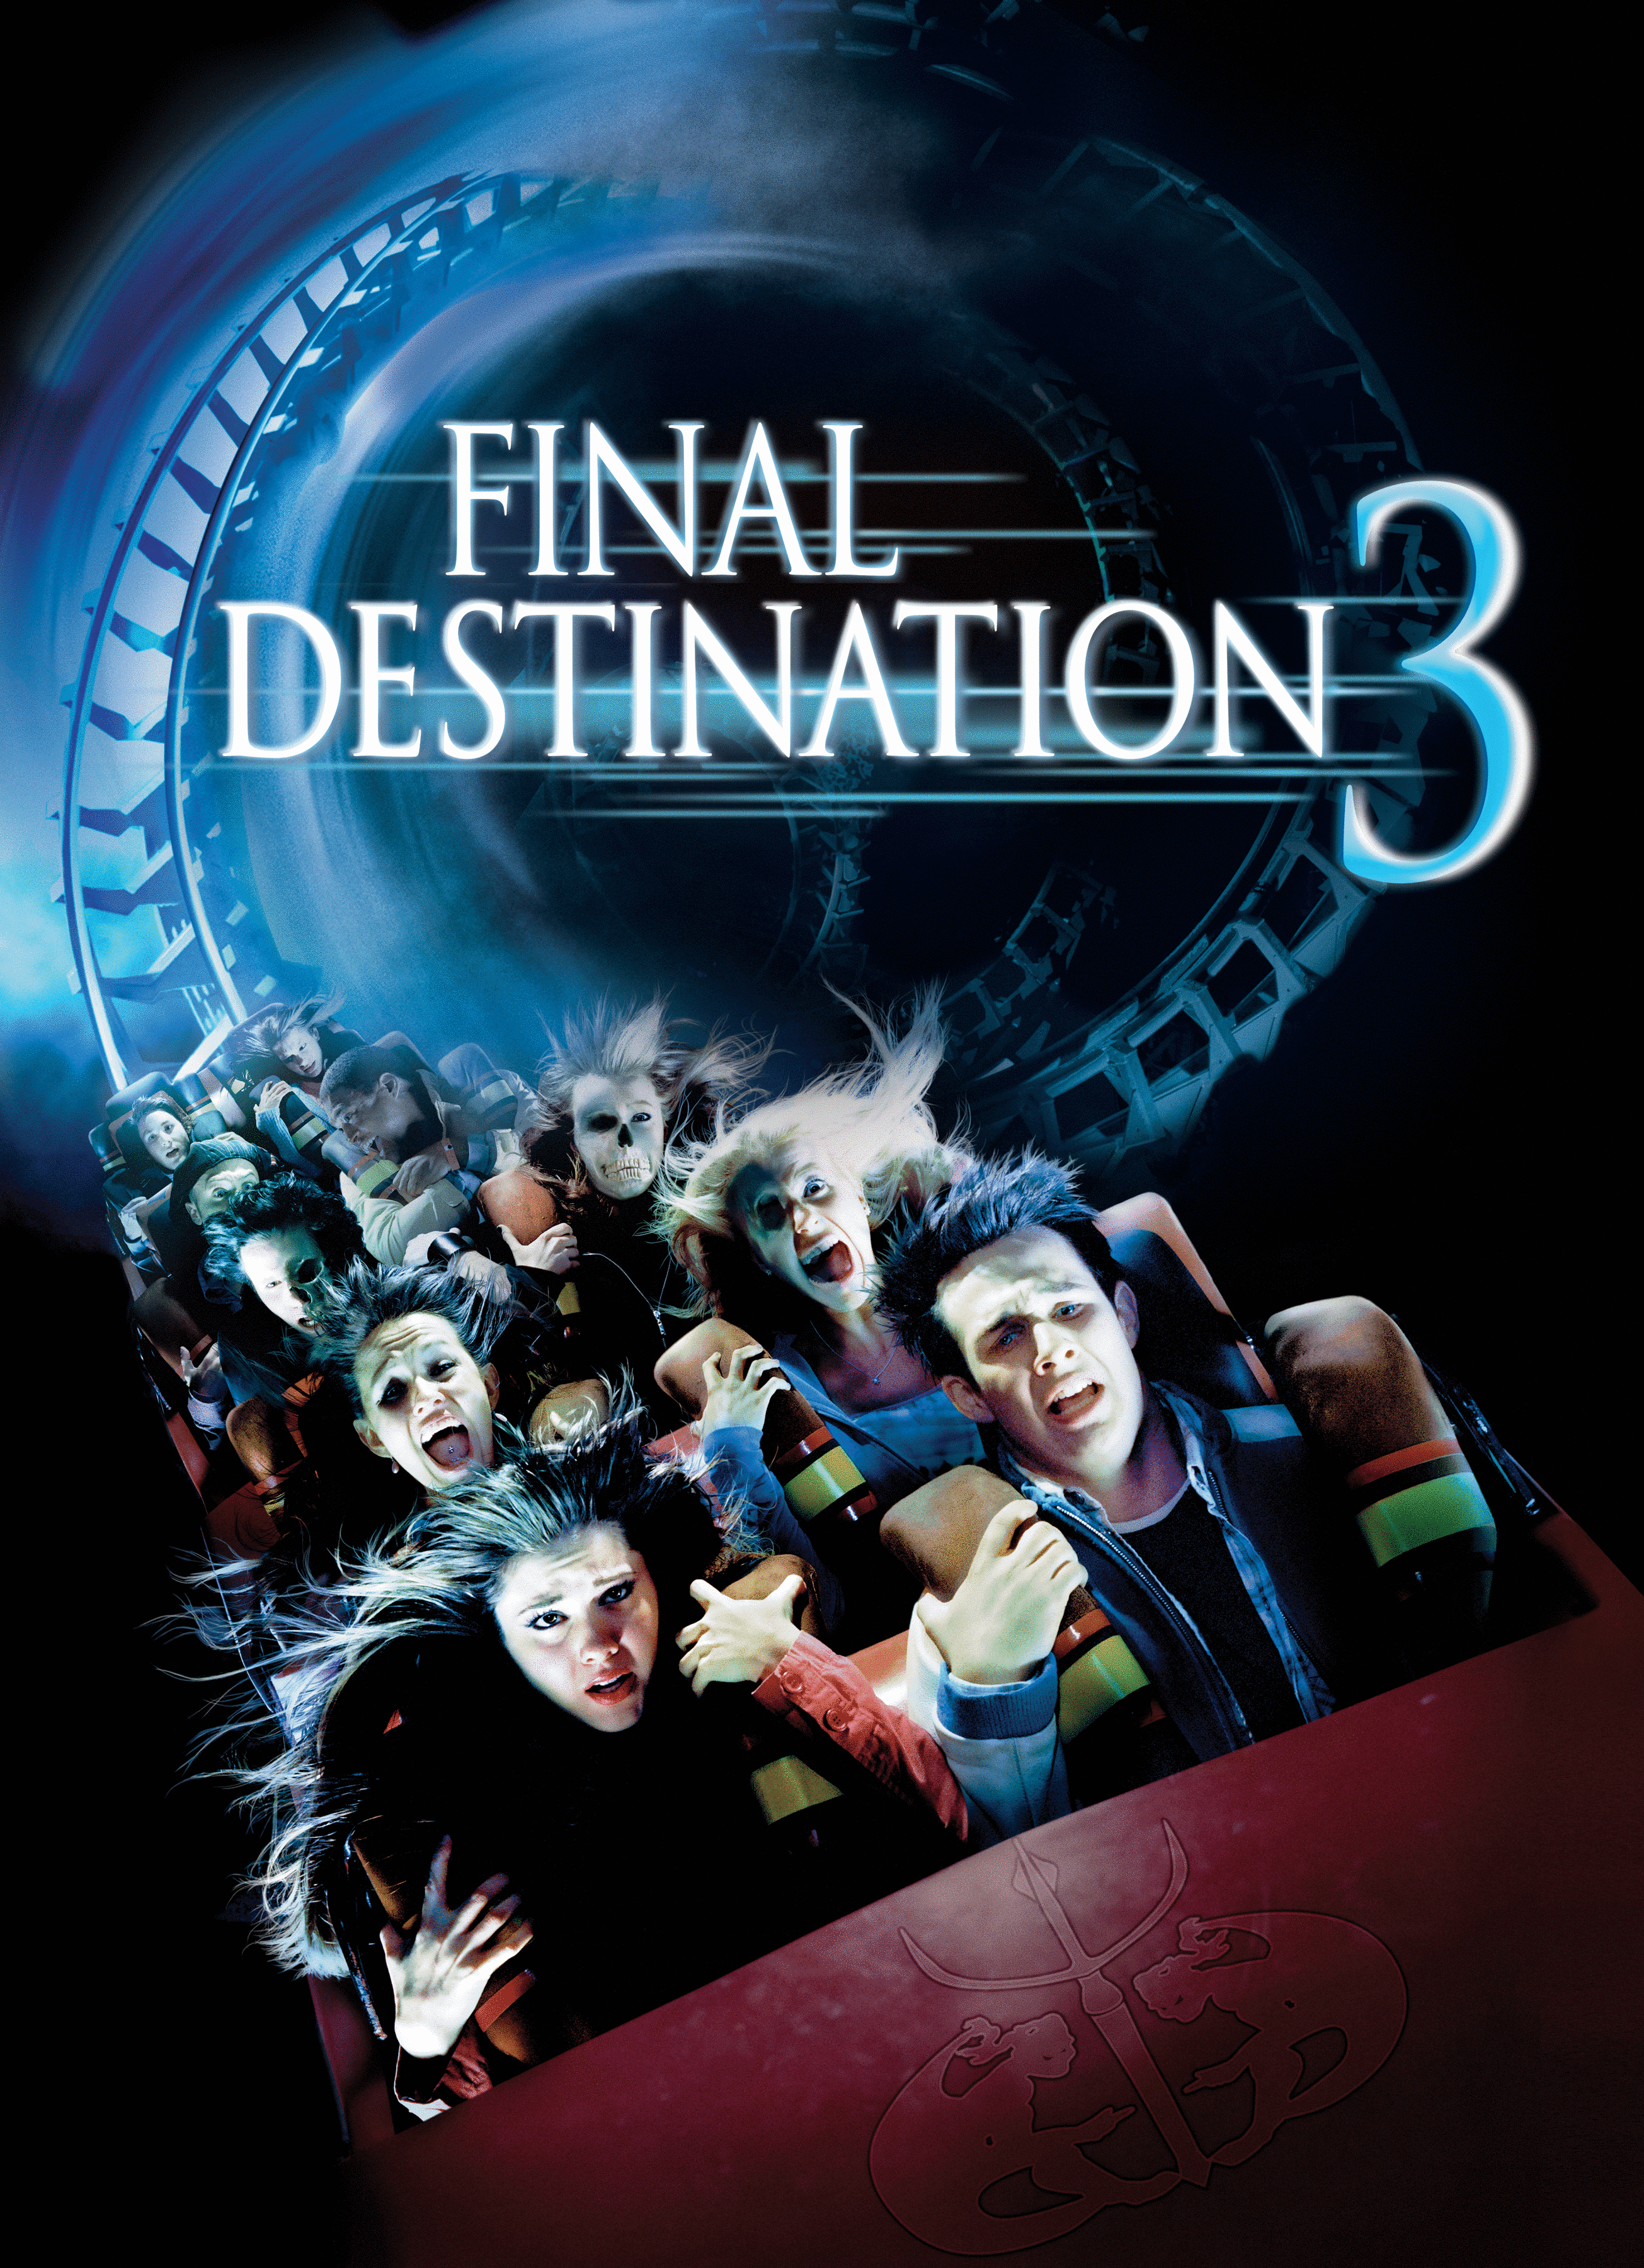 Poster for Final Destination 3